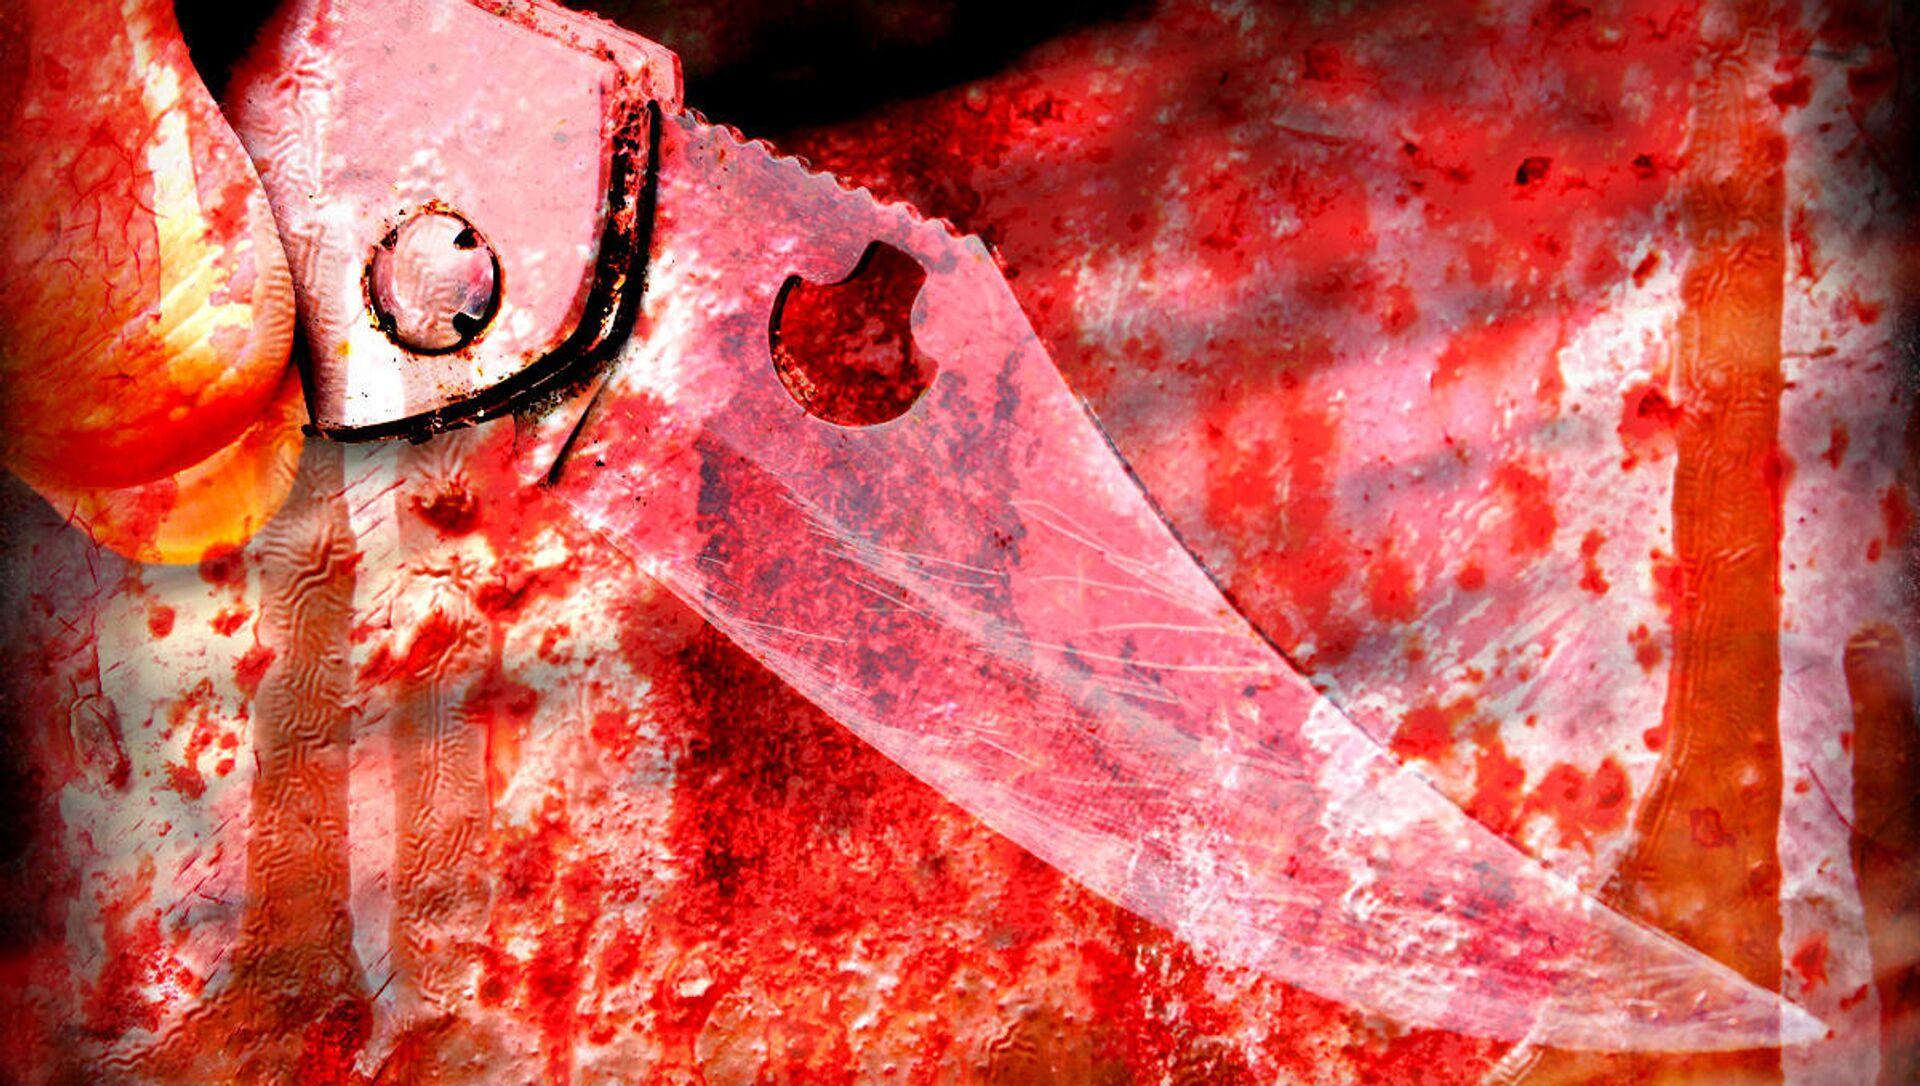 Knife in my hand - Sputnik International, 1920, 03.08.2021